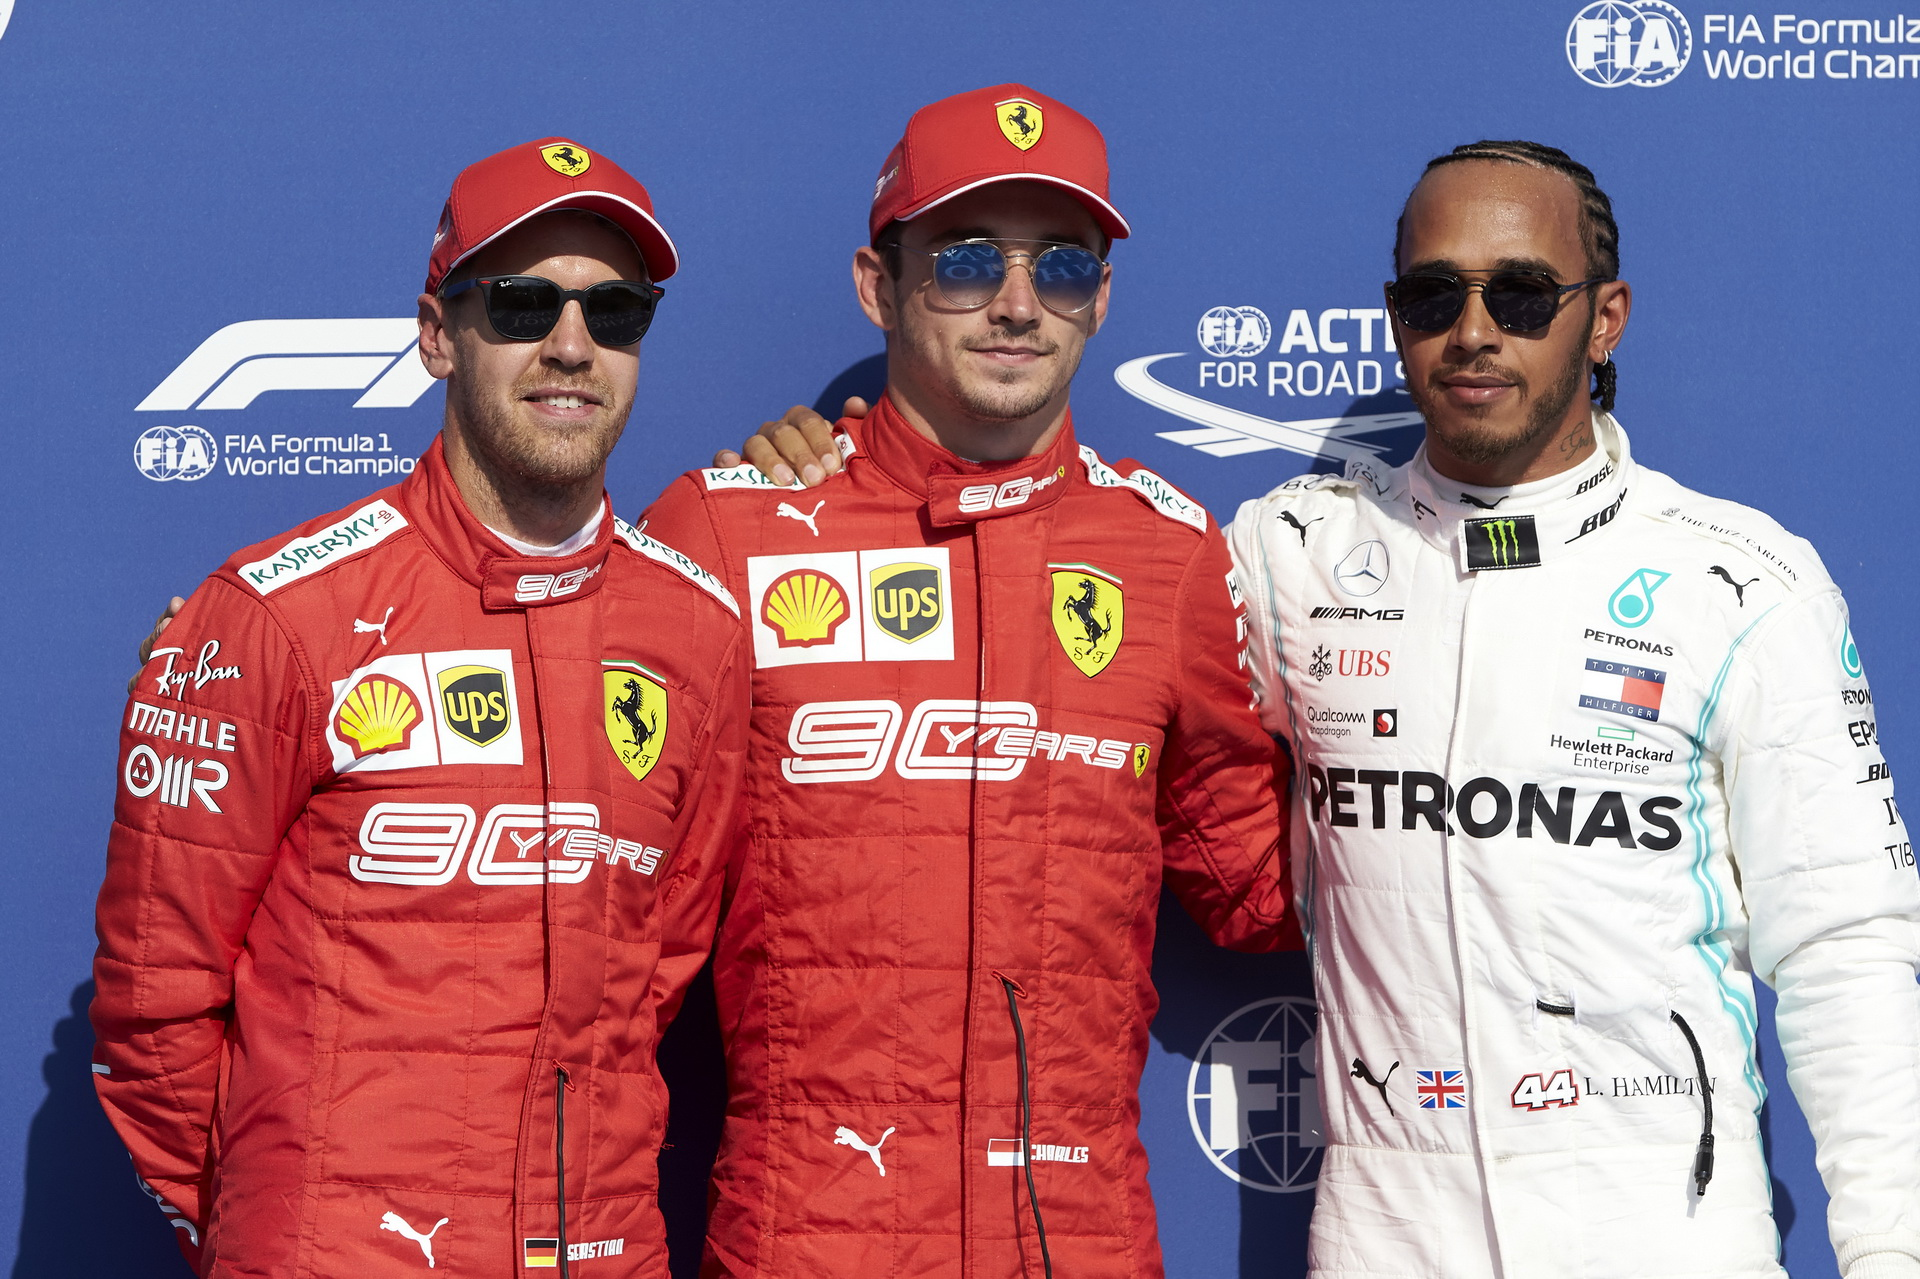 Charles Leclerc Sebastian Vettel Lewis Hamilton